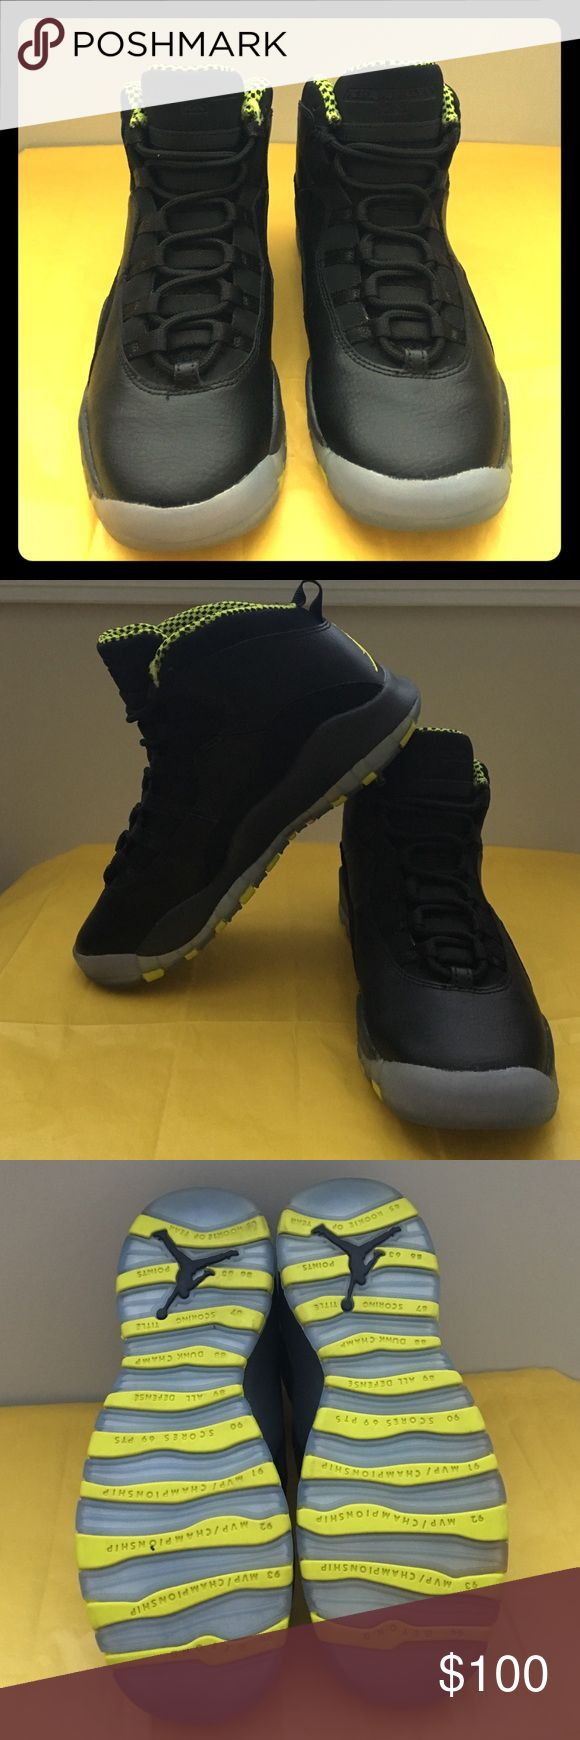 Lowest Price Nike Lebron 12 Fluorescence Green Black White 65084